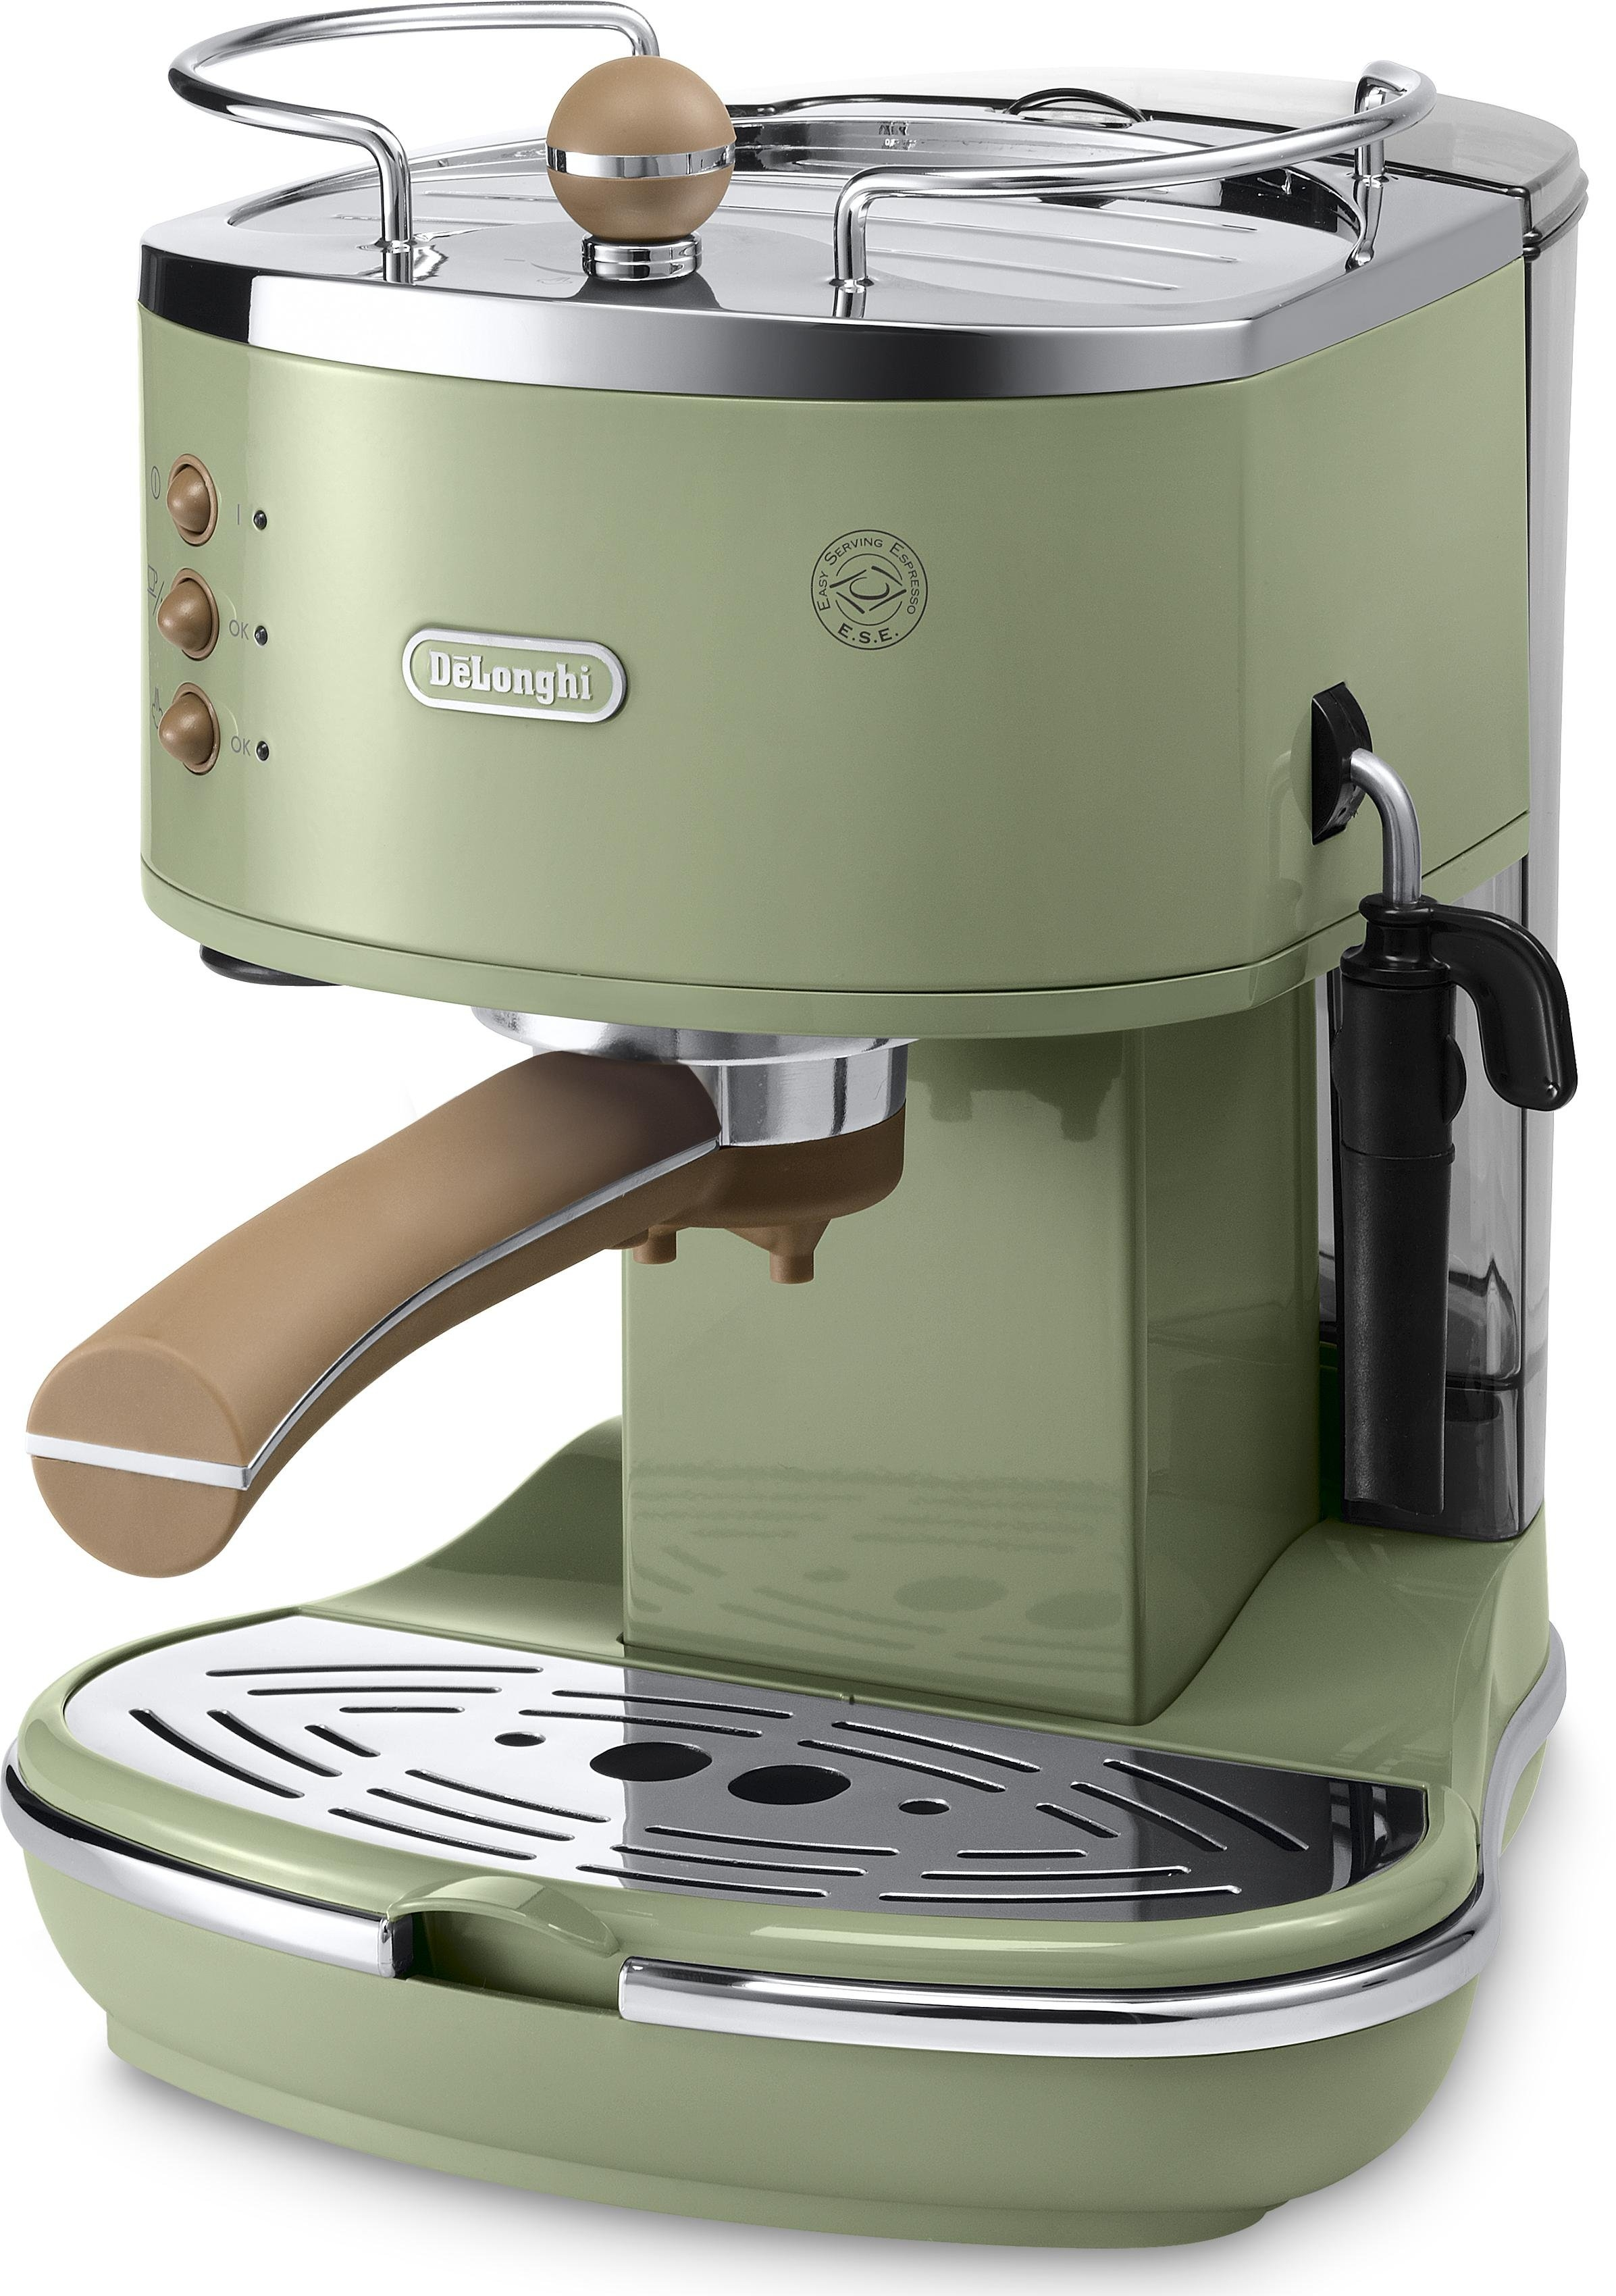 De'longhi Espresso-apparaat ECOV 311.BK - gratis ruilen op otto.nl